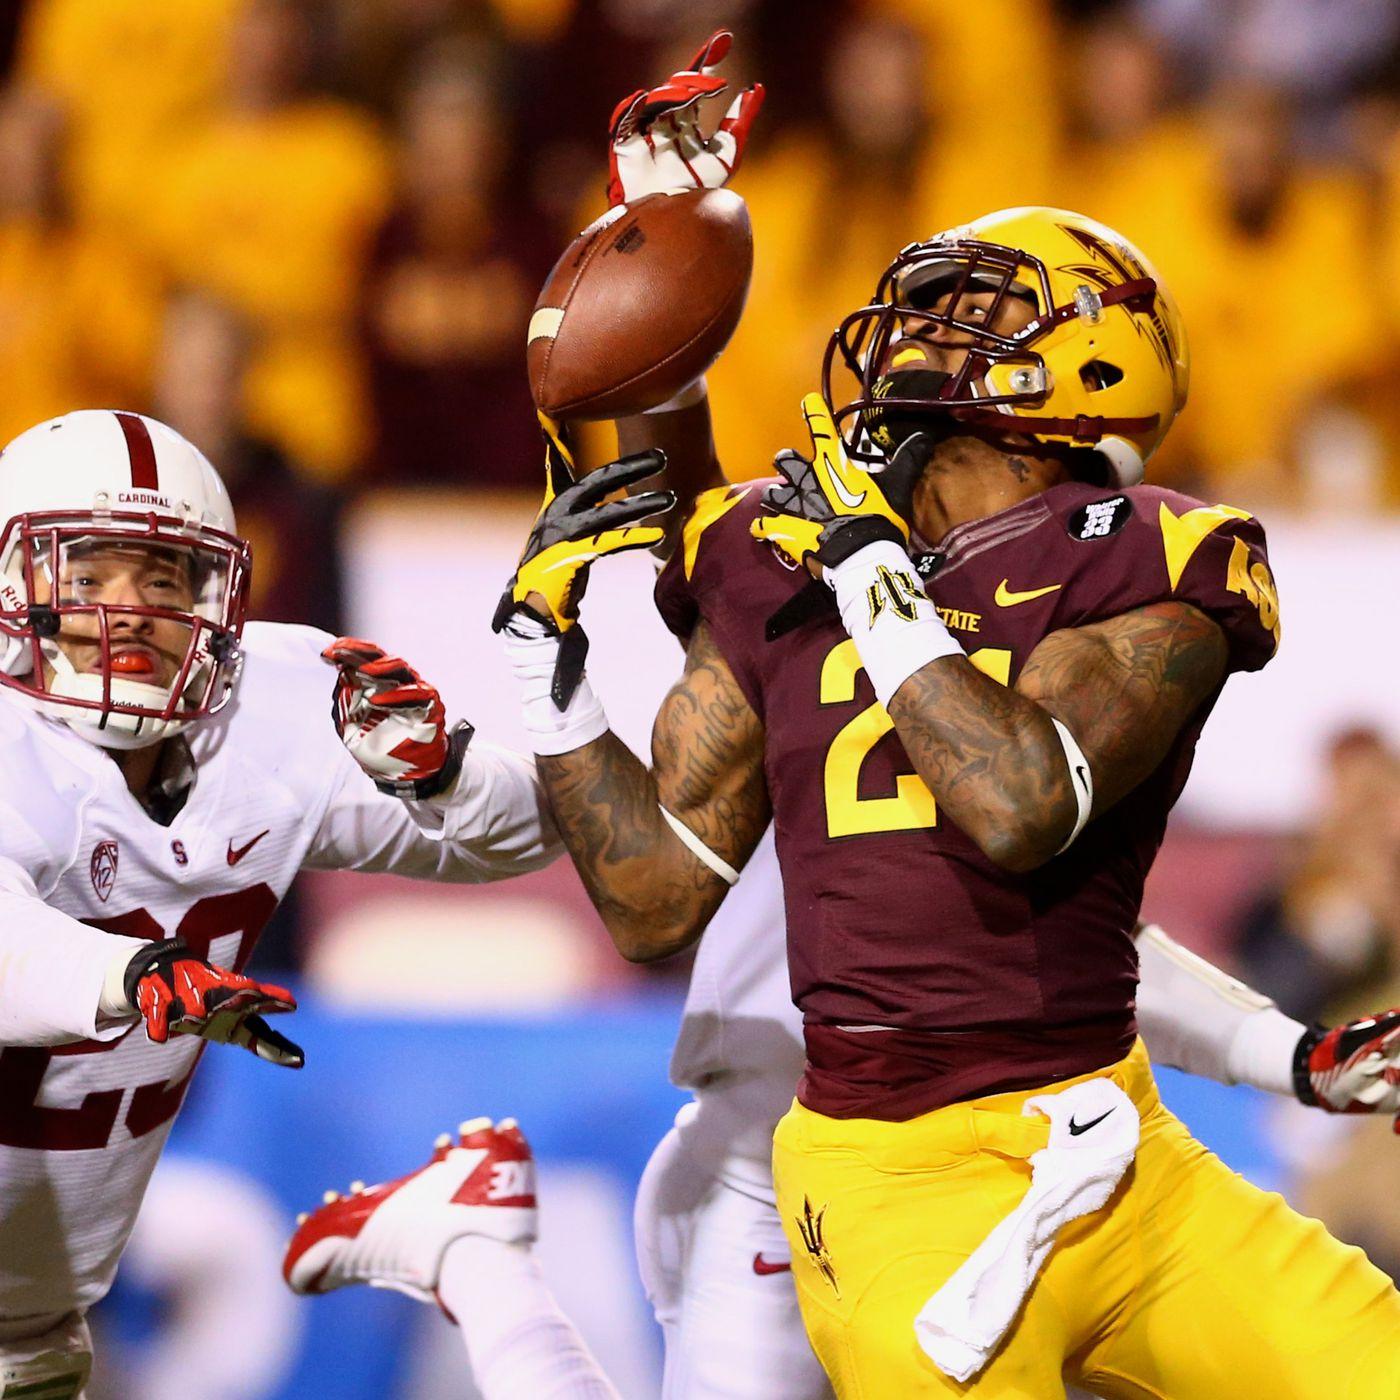 0ff89984e ASU Football Recruiting: Wide receiver becomes a position of strength. New  ...